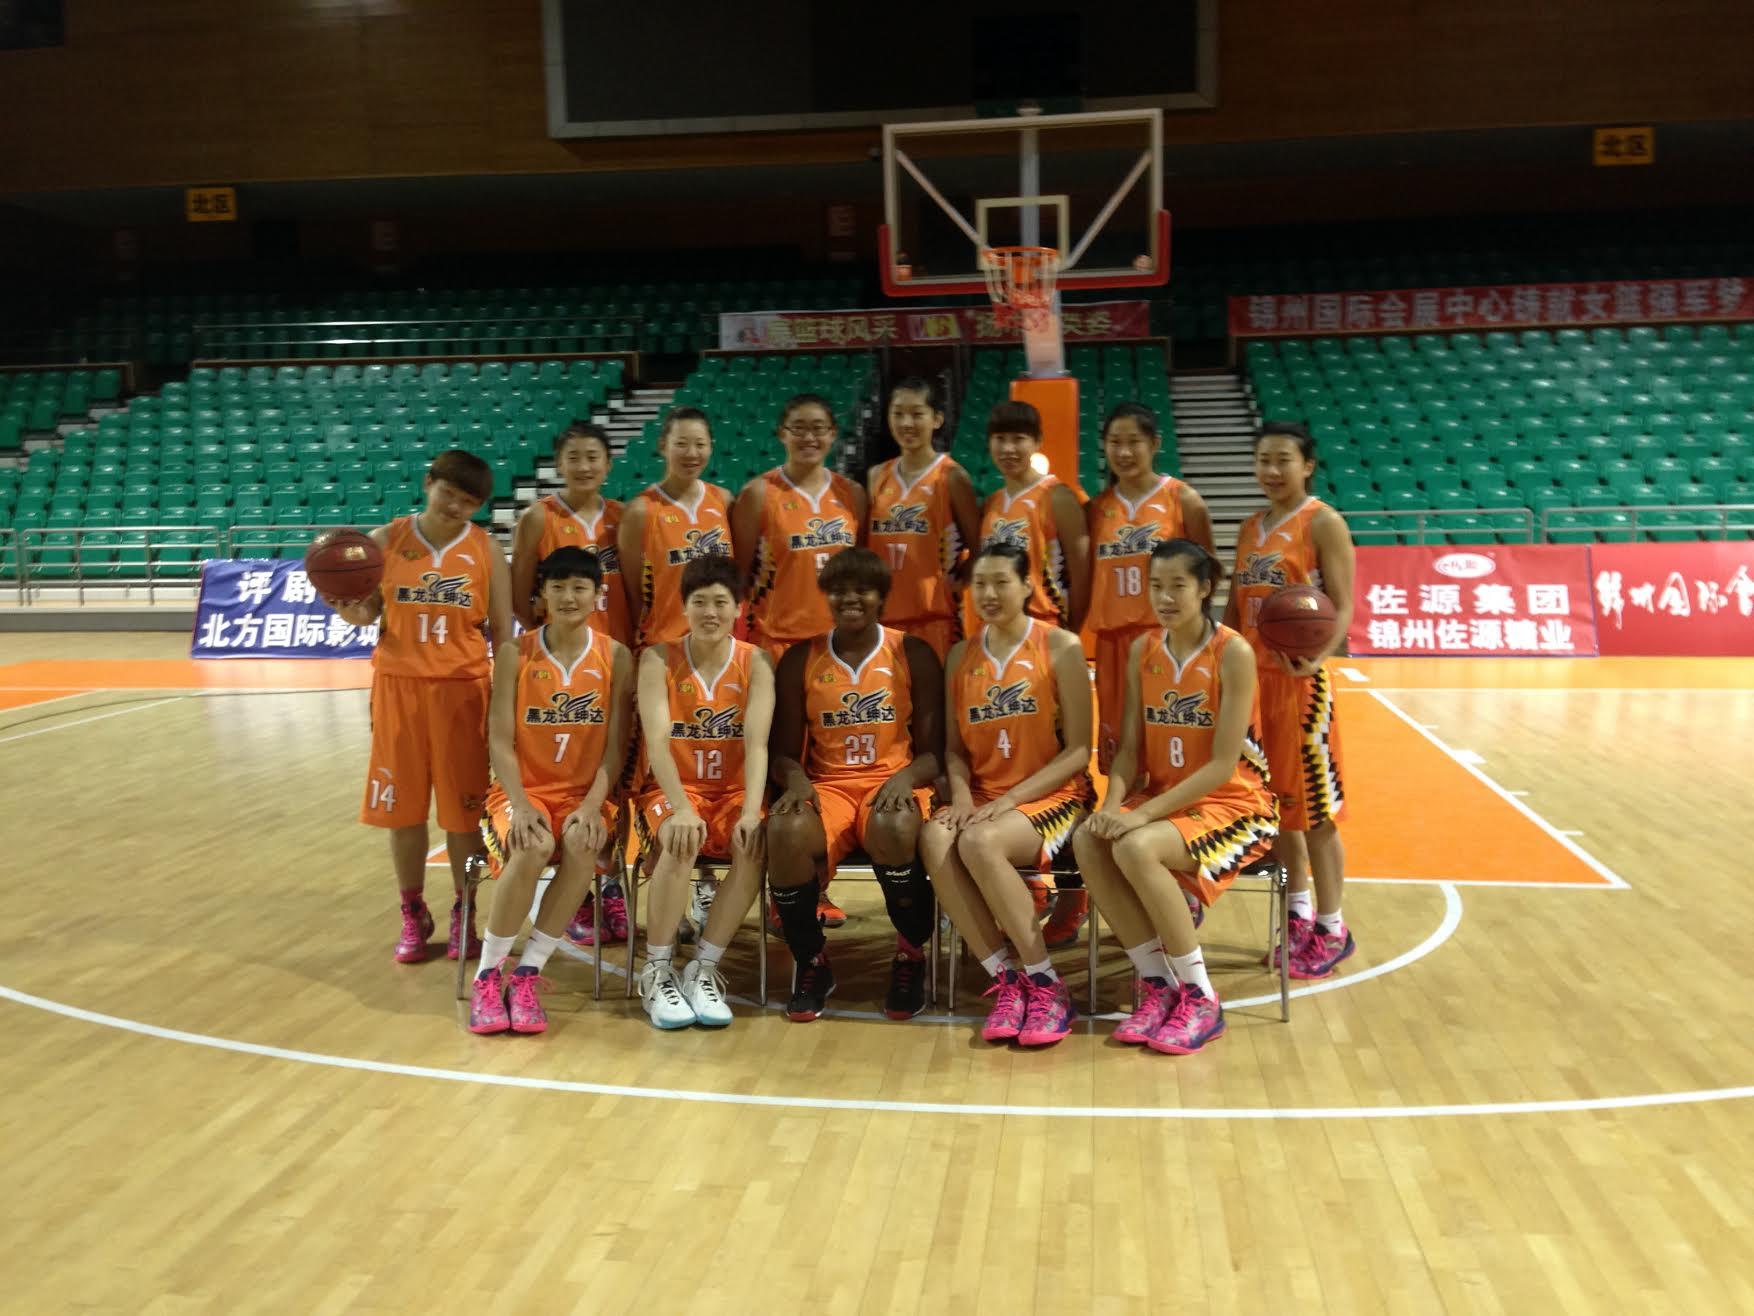 2014-11-26-equipe.jpg